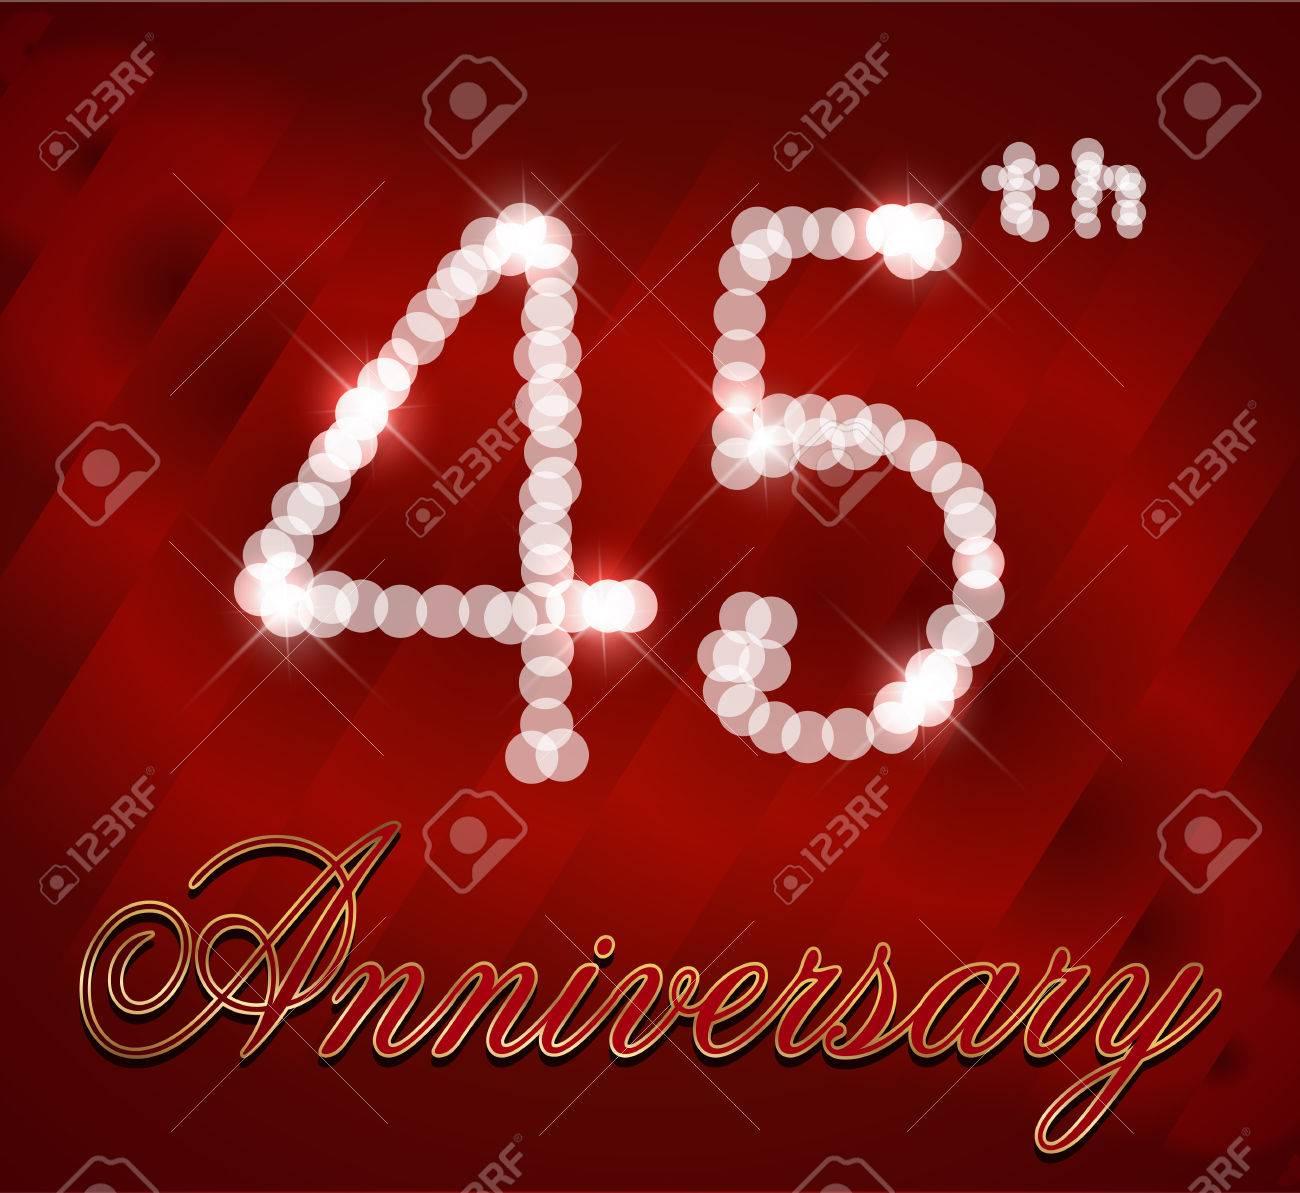 45 Year Happy Birthday Card 45th Vector EPS10 Stock